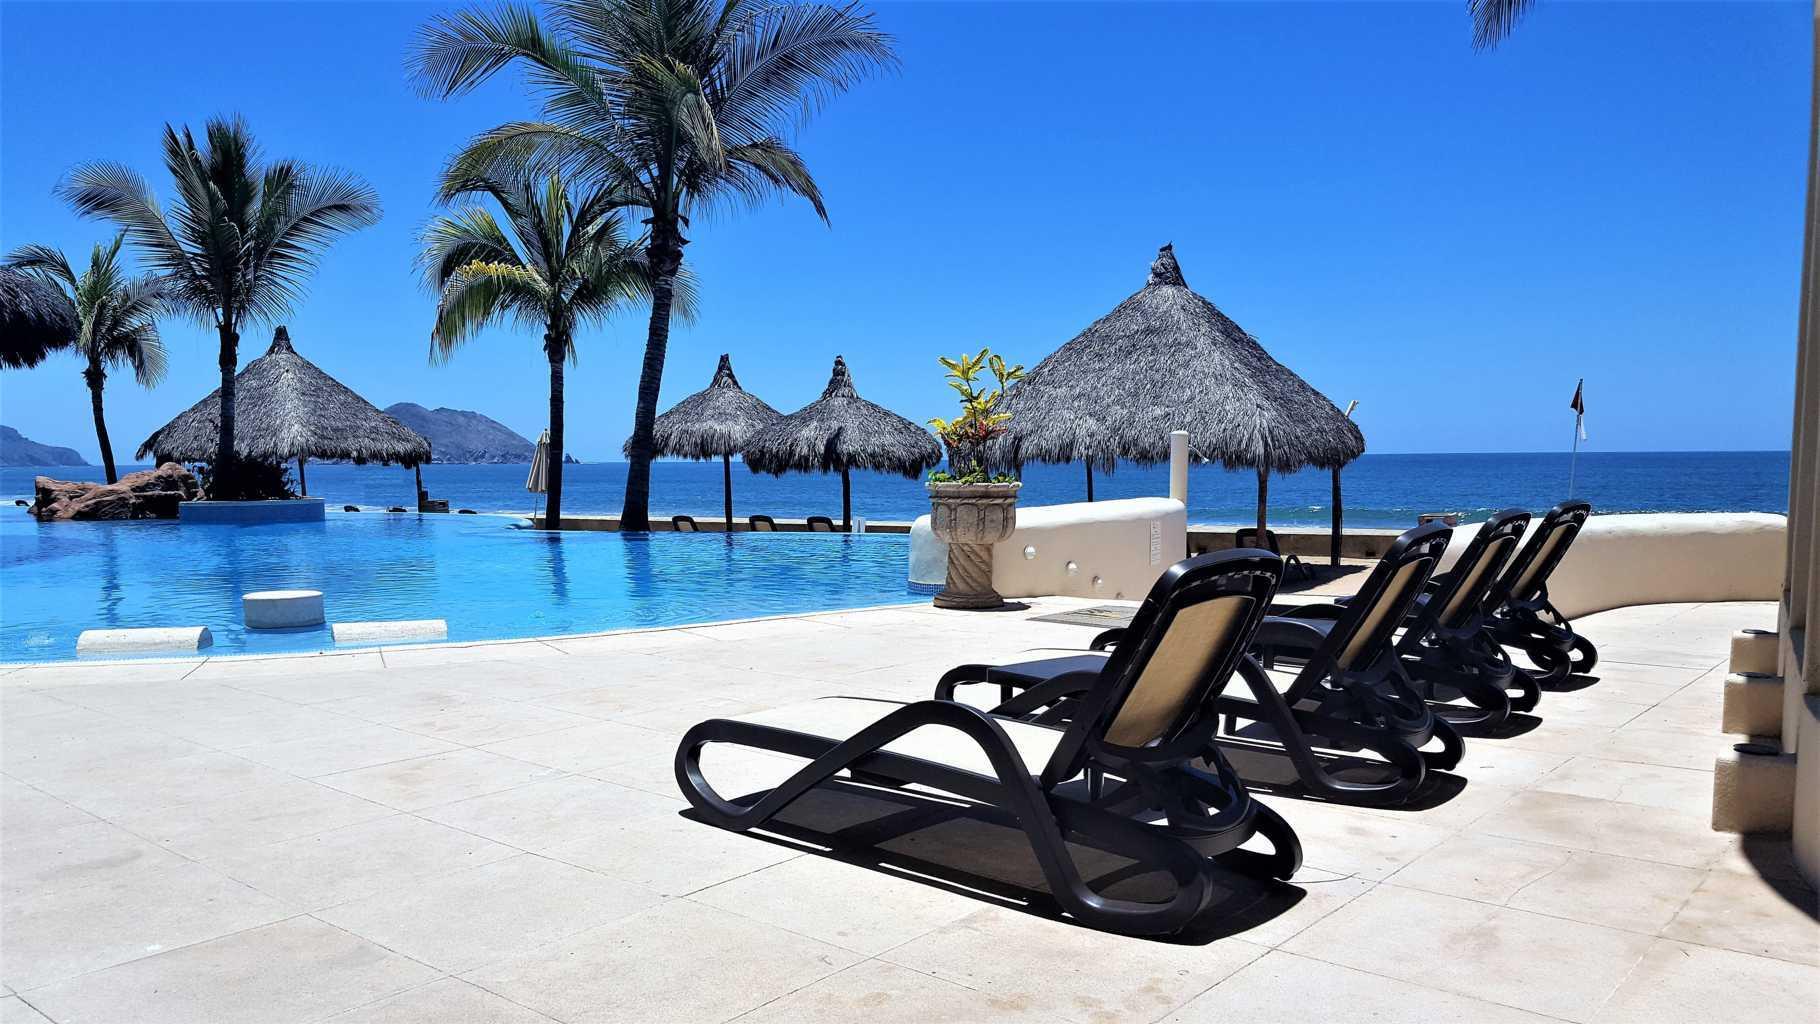 Luxurious beachfront condo – MAJOR PRICE REDUCTION!